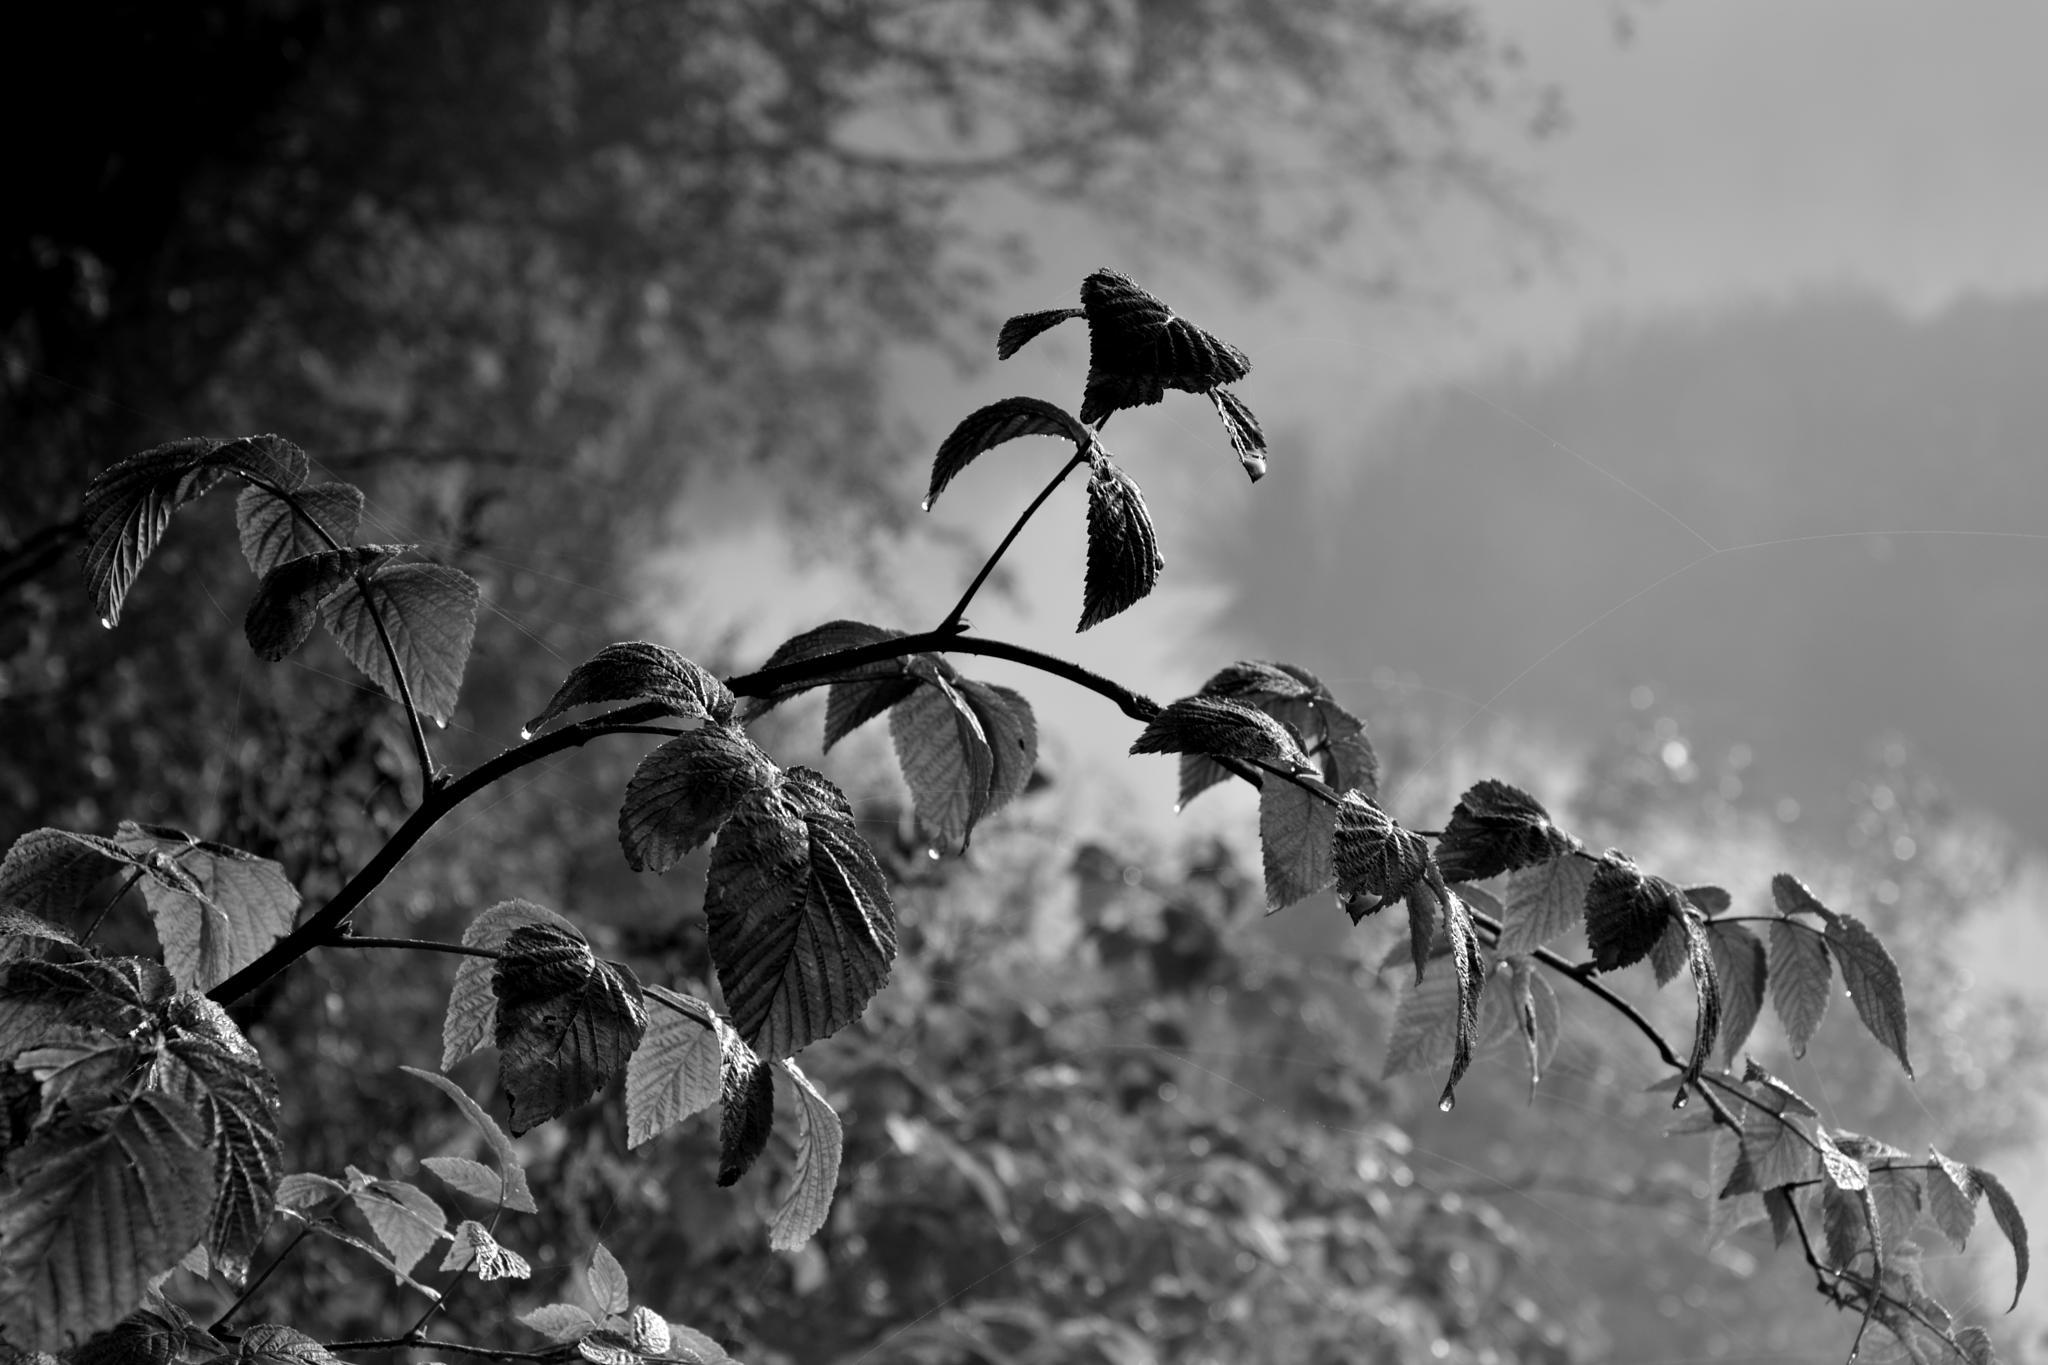 """Waiting the light"" by Ole Vikshaaland"